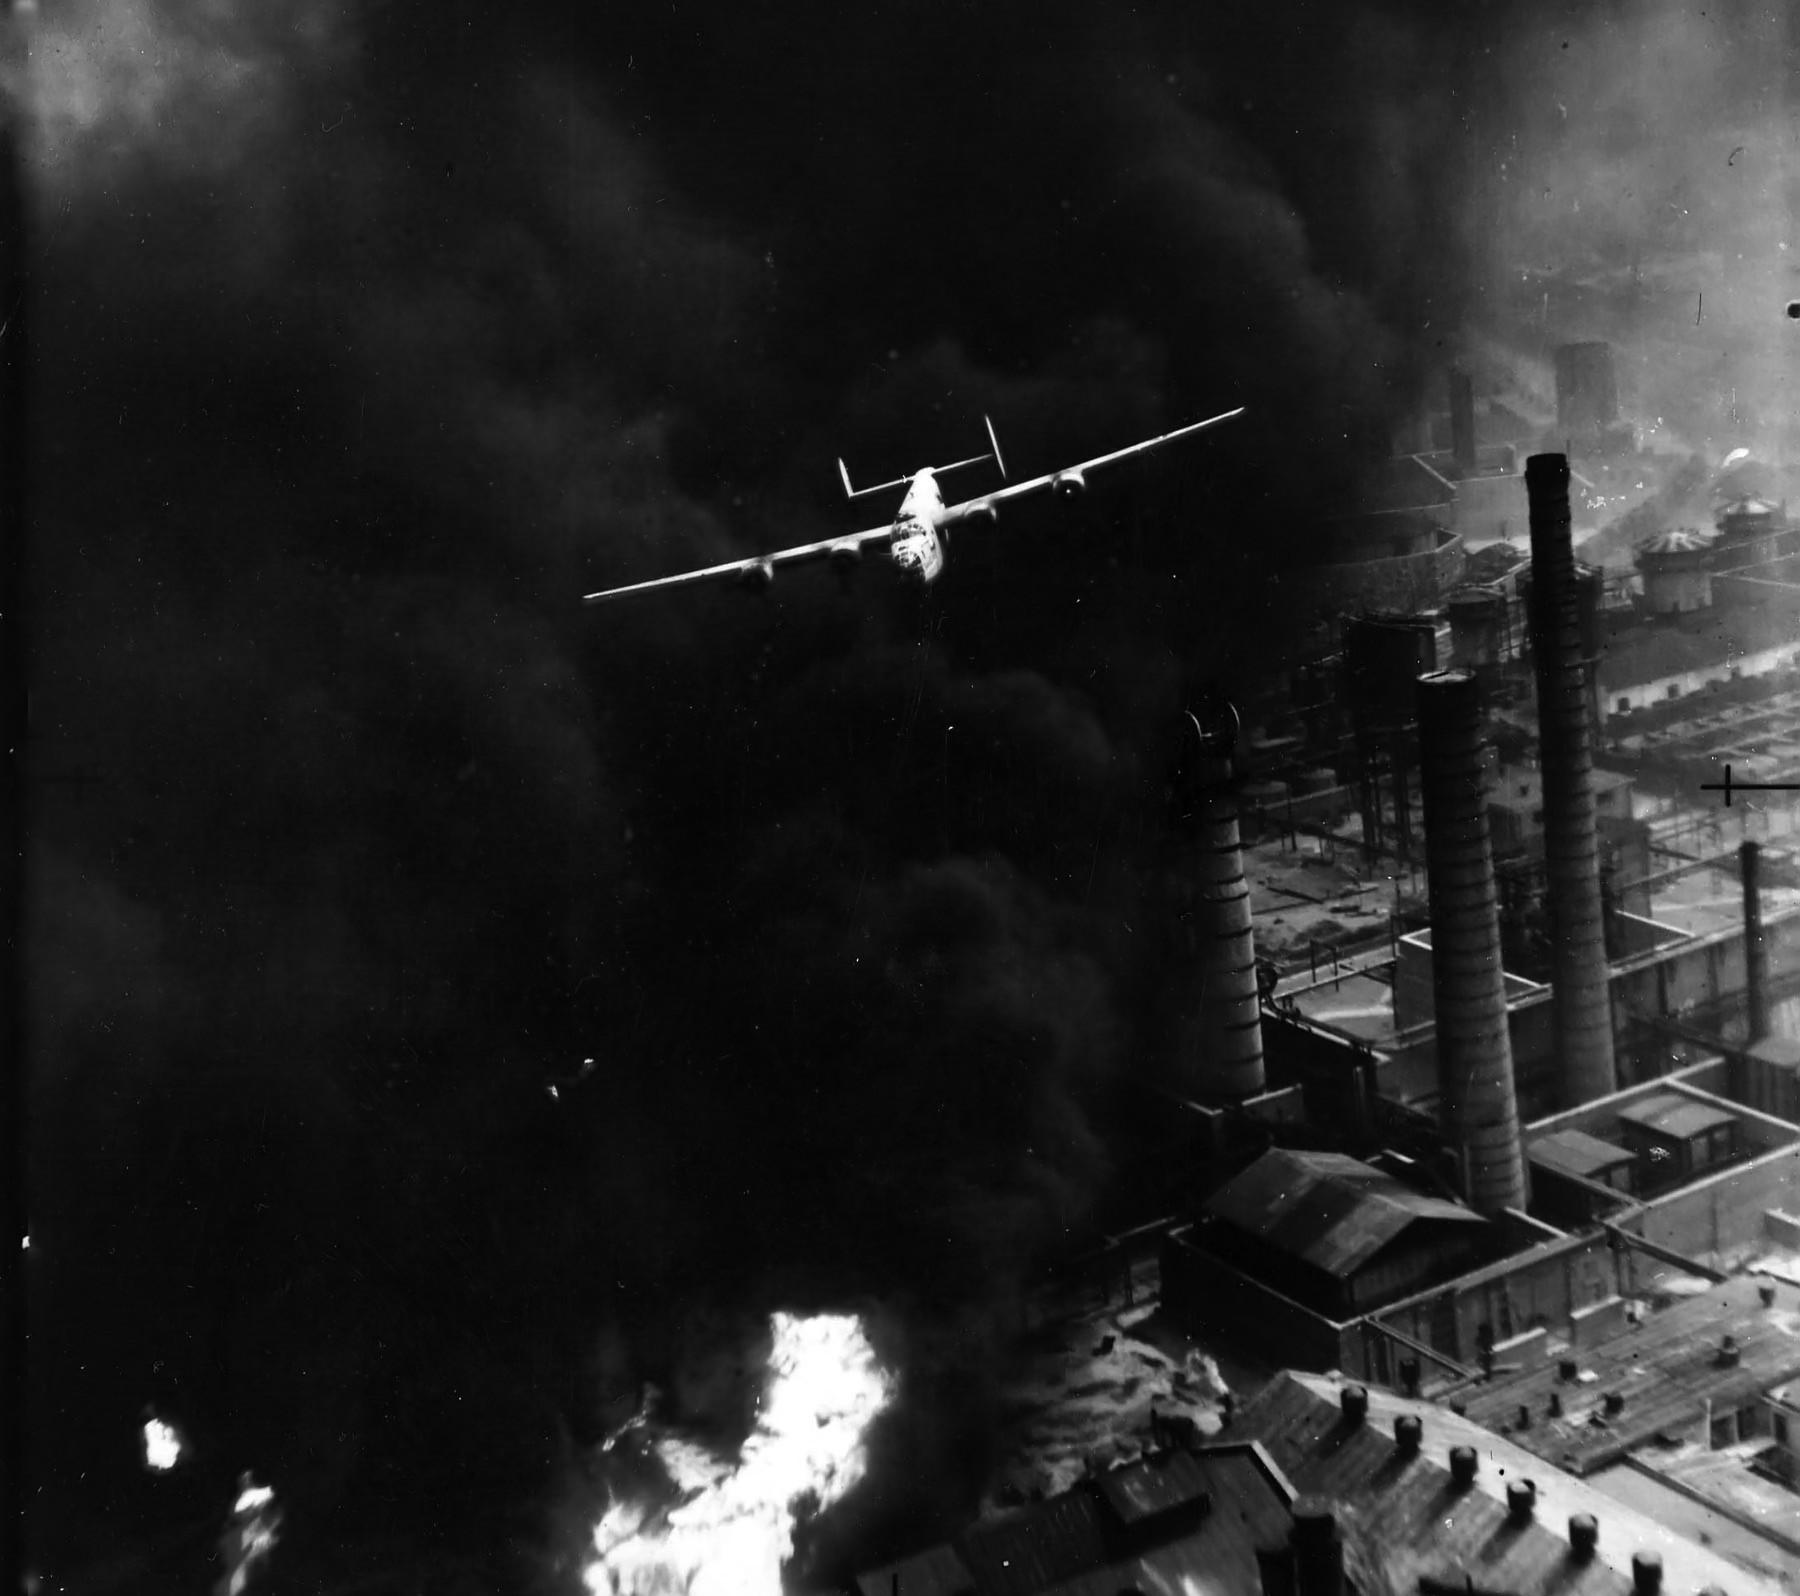 Strategic bombing during World War II - Wikipedia